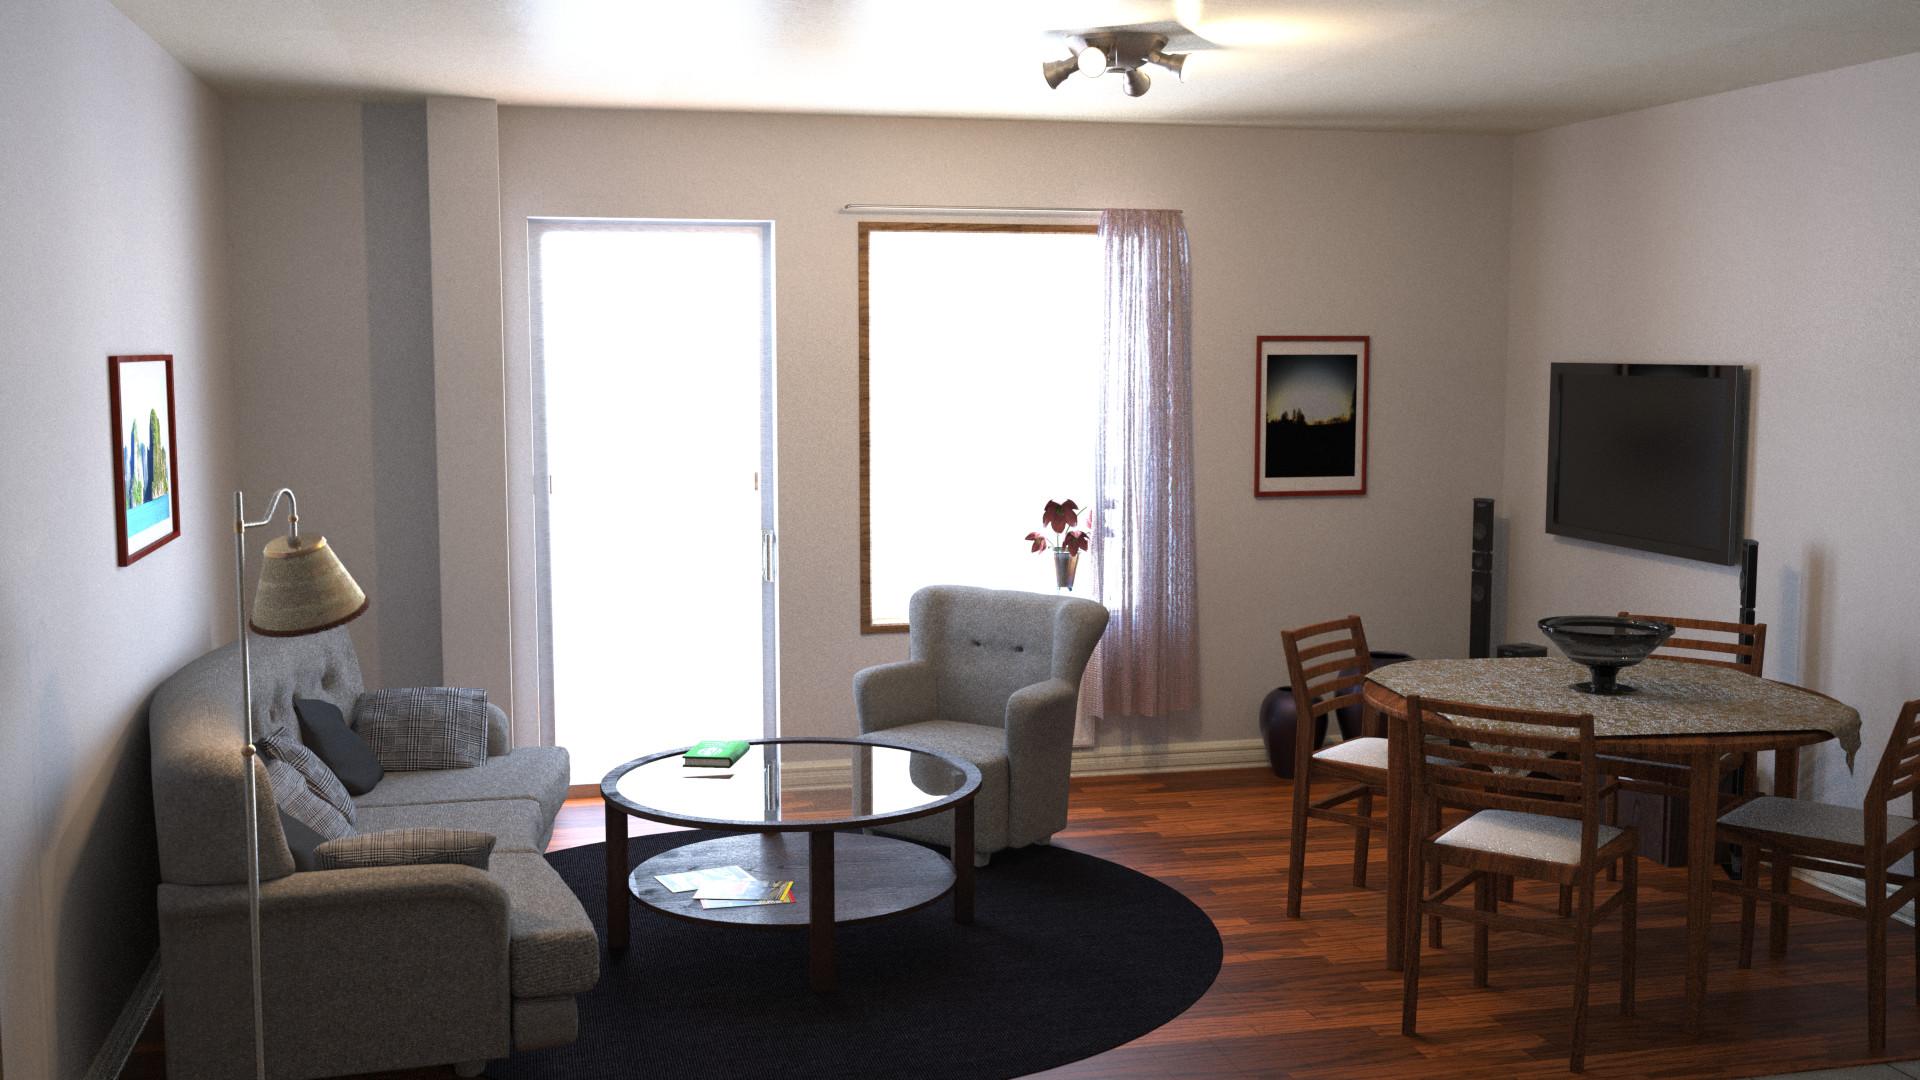 Rick irvine copy of livingroom